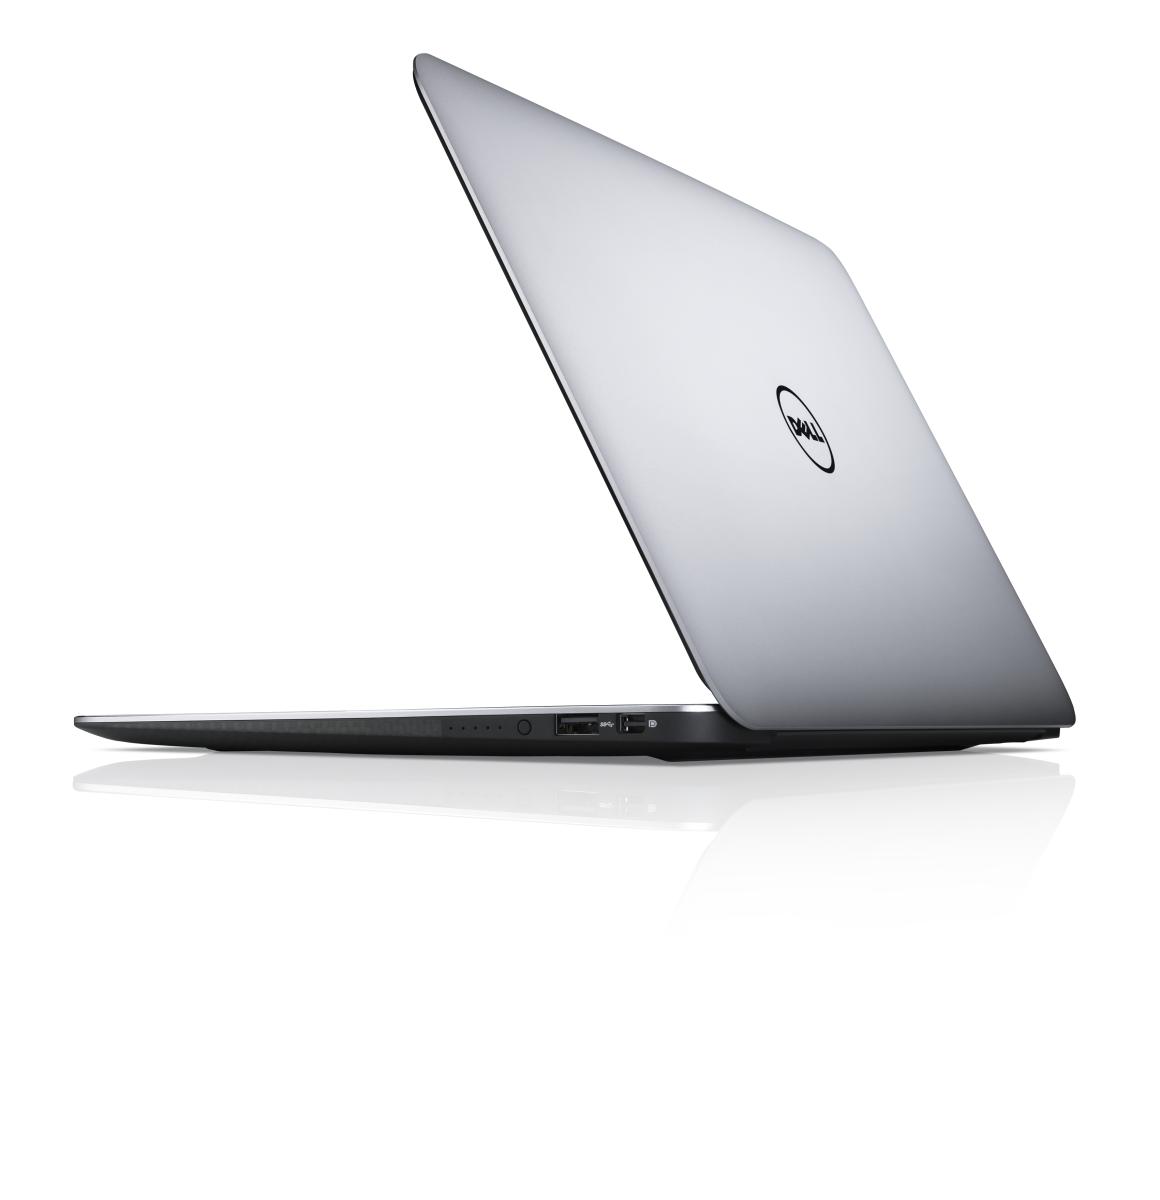 Dell XPS 13 - otwarta klapa